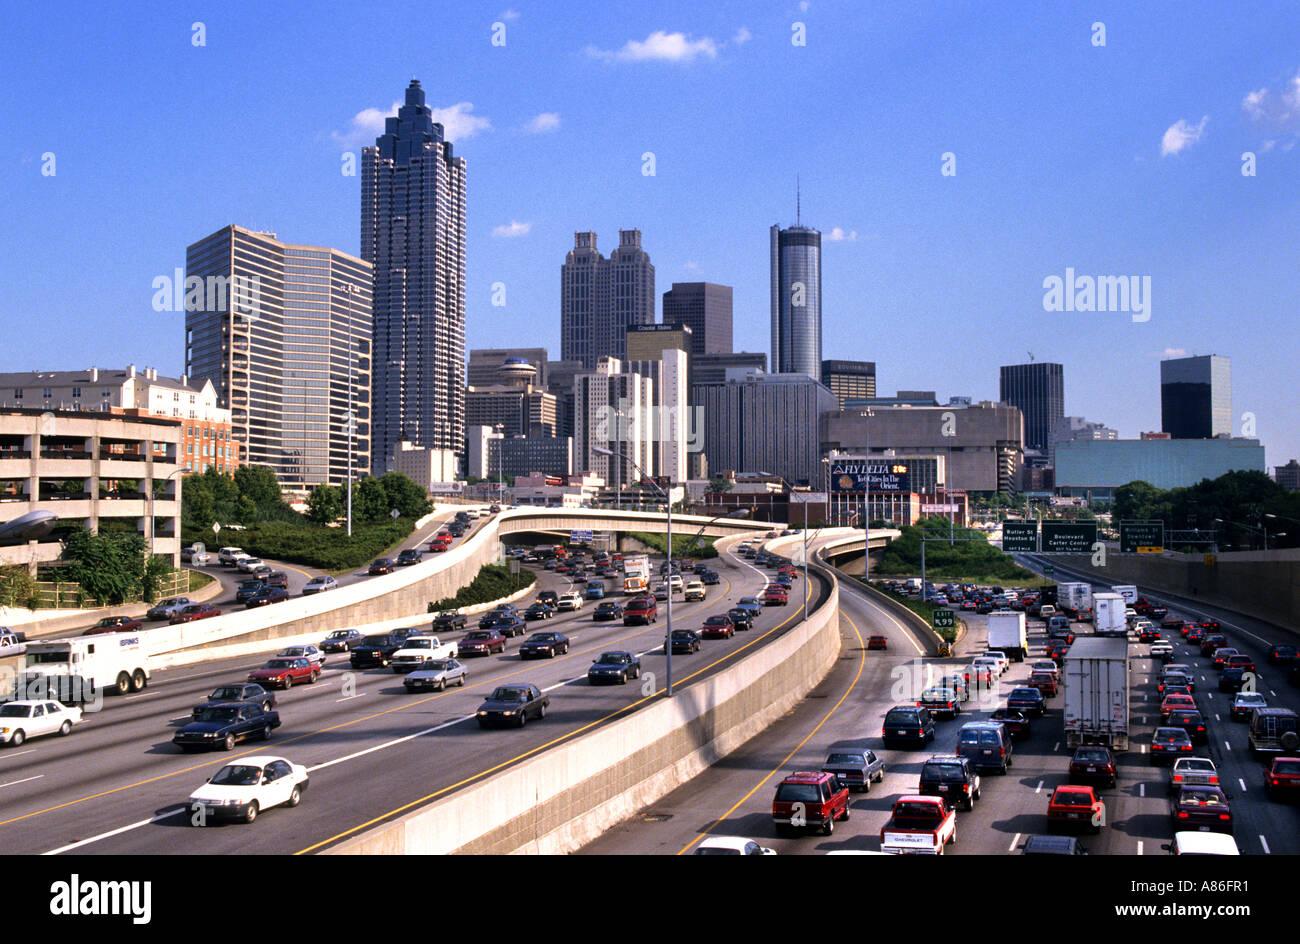 Town And Country Auto >> Atlanta Georgia United States of America town USA Stock Photo: 6859184 - Alamy